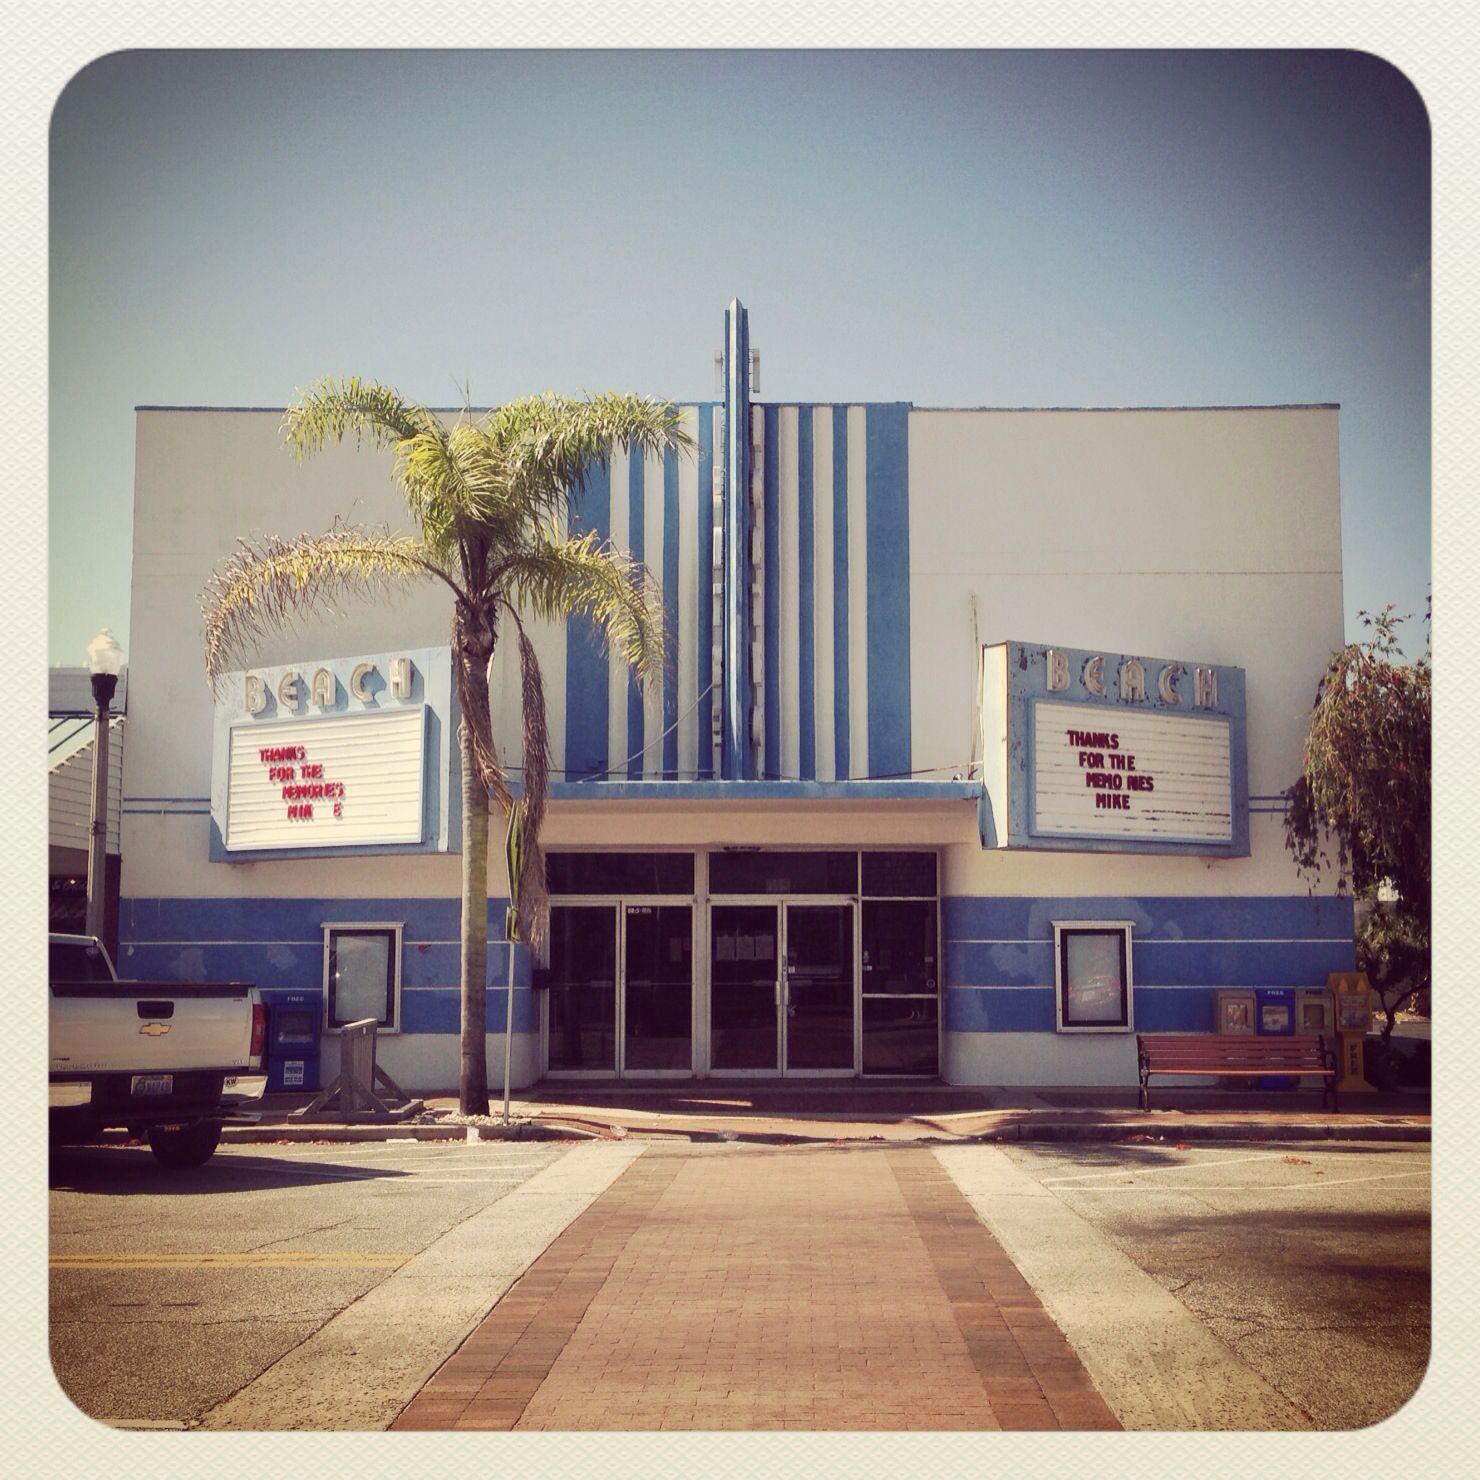 Beach theater at st petes beach florida iconic art